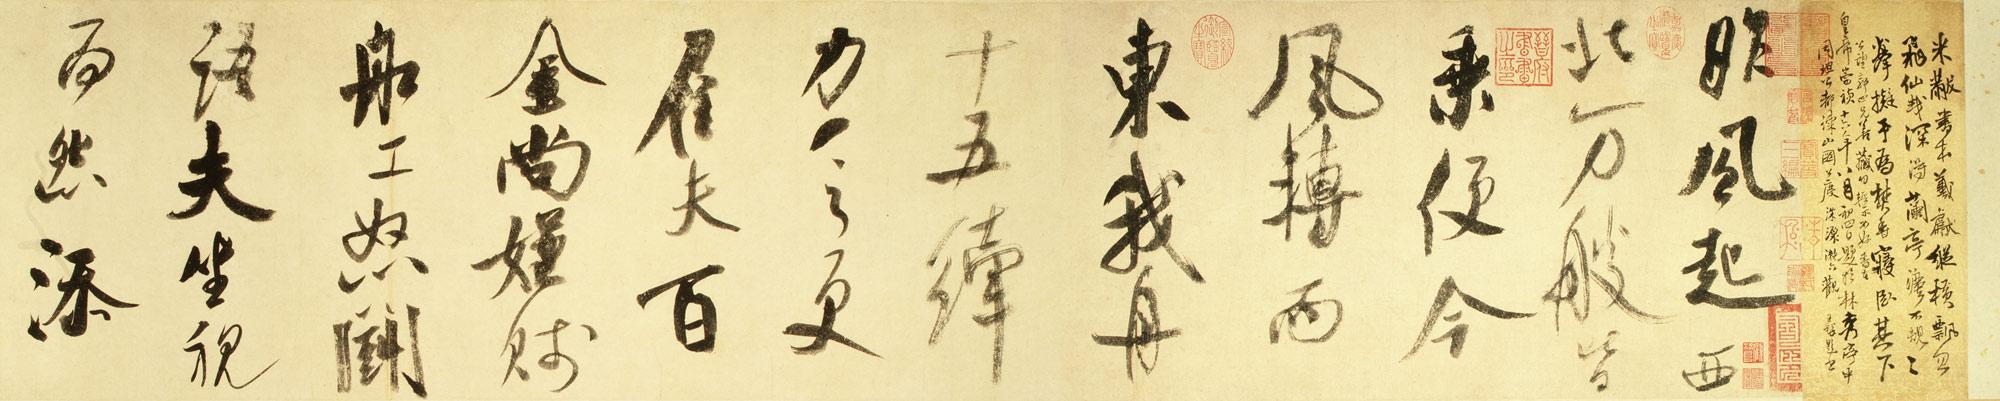 chinese calligraphy essay heilbrunn timeline of art history